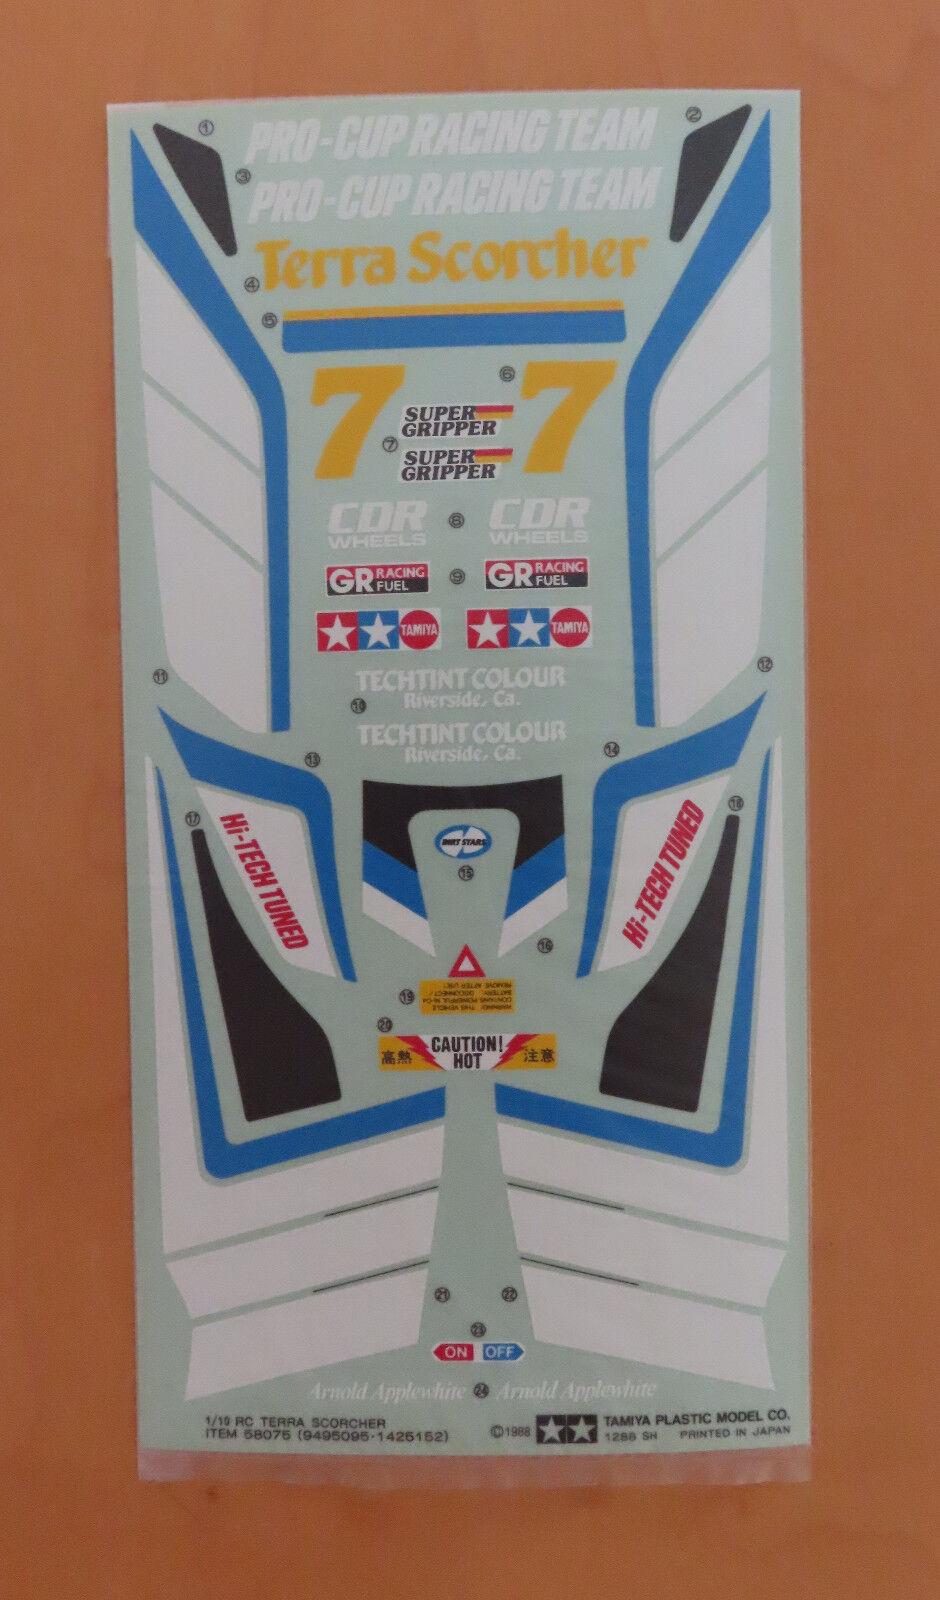 RC Tamiya Decalcomania Terra Scorcher 58075 NEU Nuovo con Scatola 1988